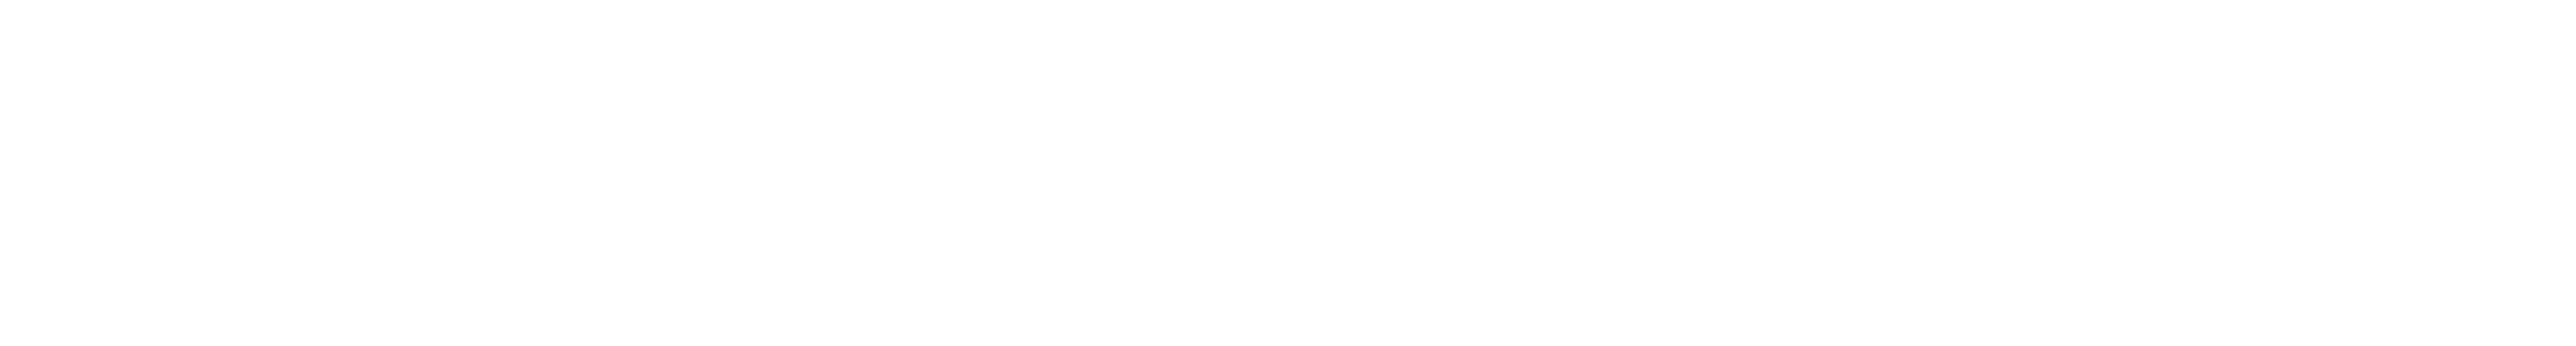 The OGNC